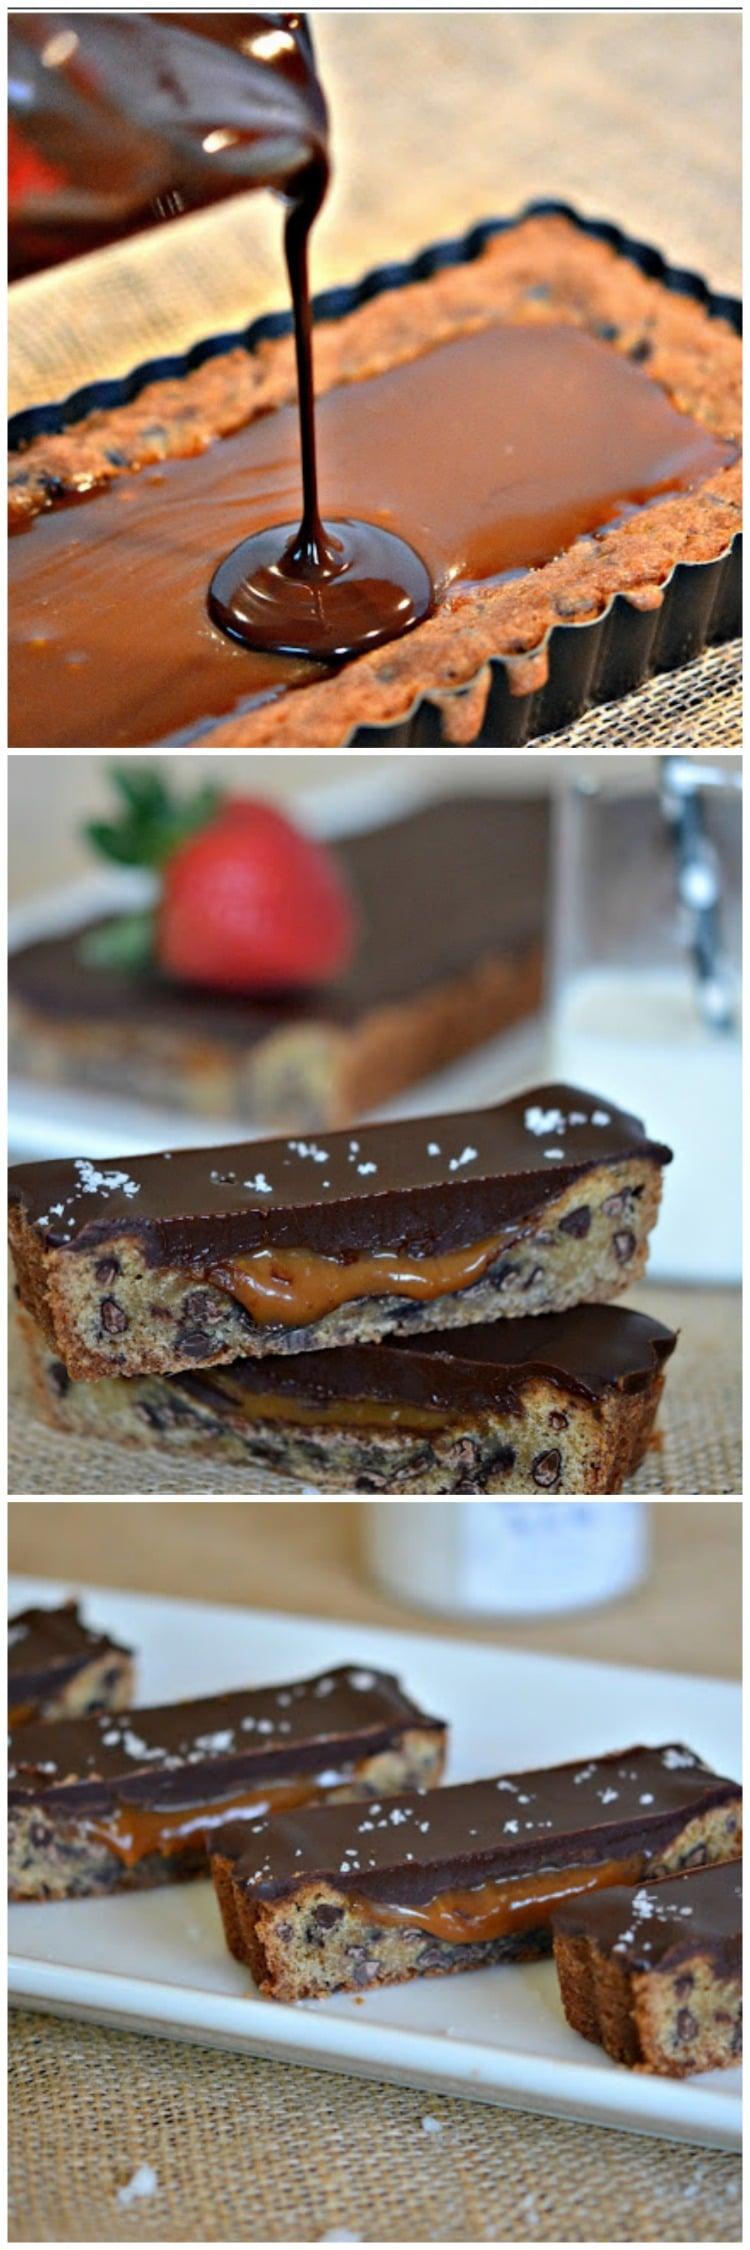 CHOCOLATE GLAZED, SALTED CARAMEL & CHOCOLATE CHIP COOKIE TART - Hugs ...